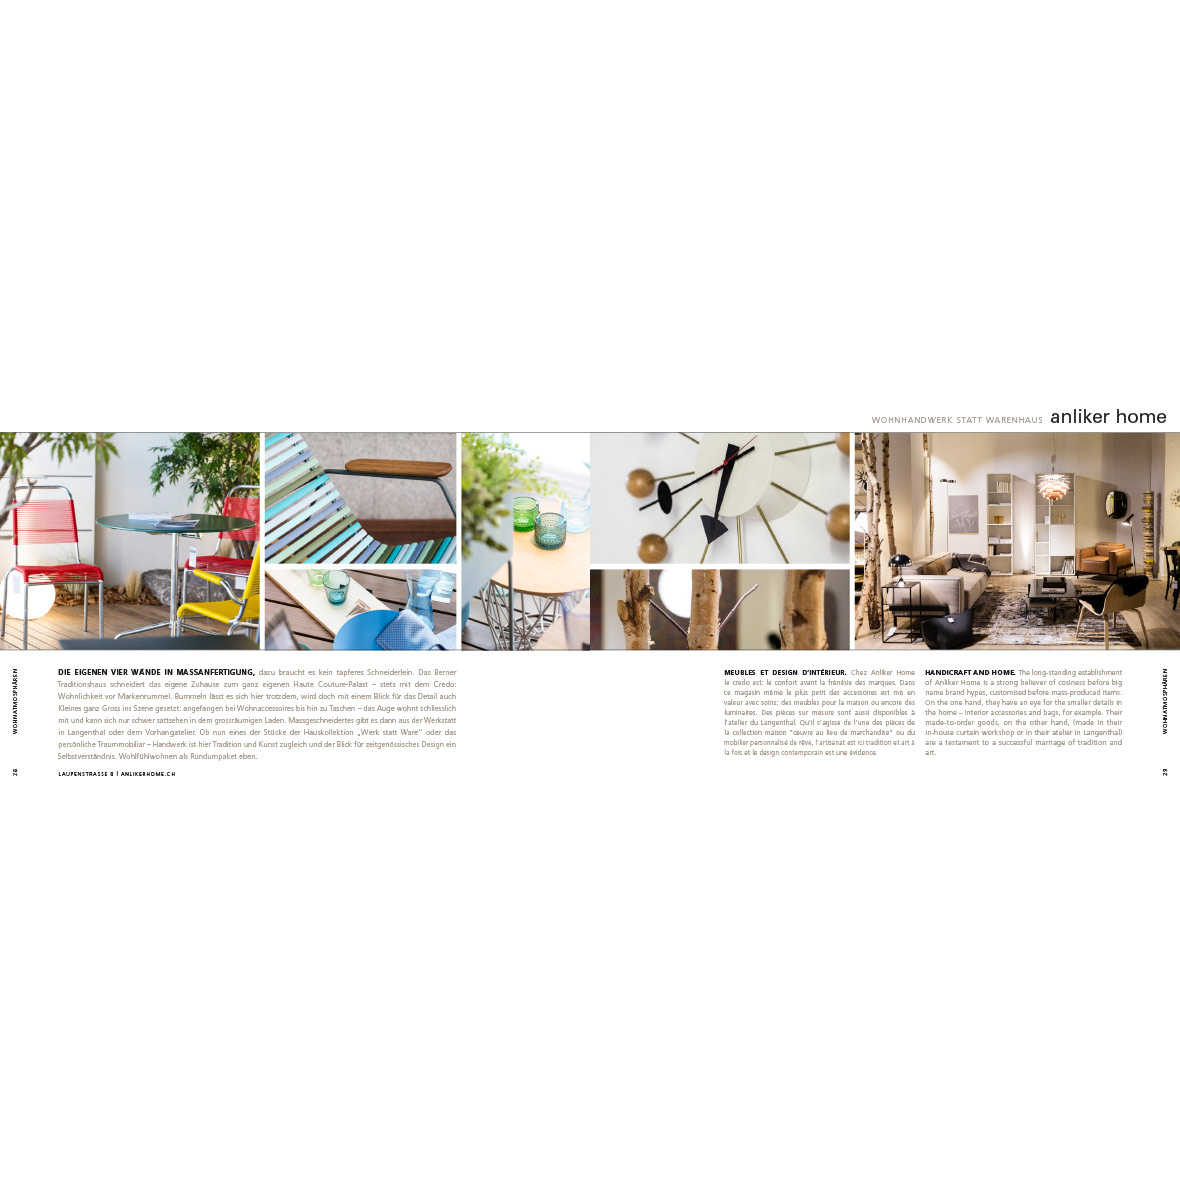 Stadtbuch - Einfach Bern Edition 2 - Anliker Home